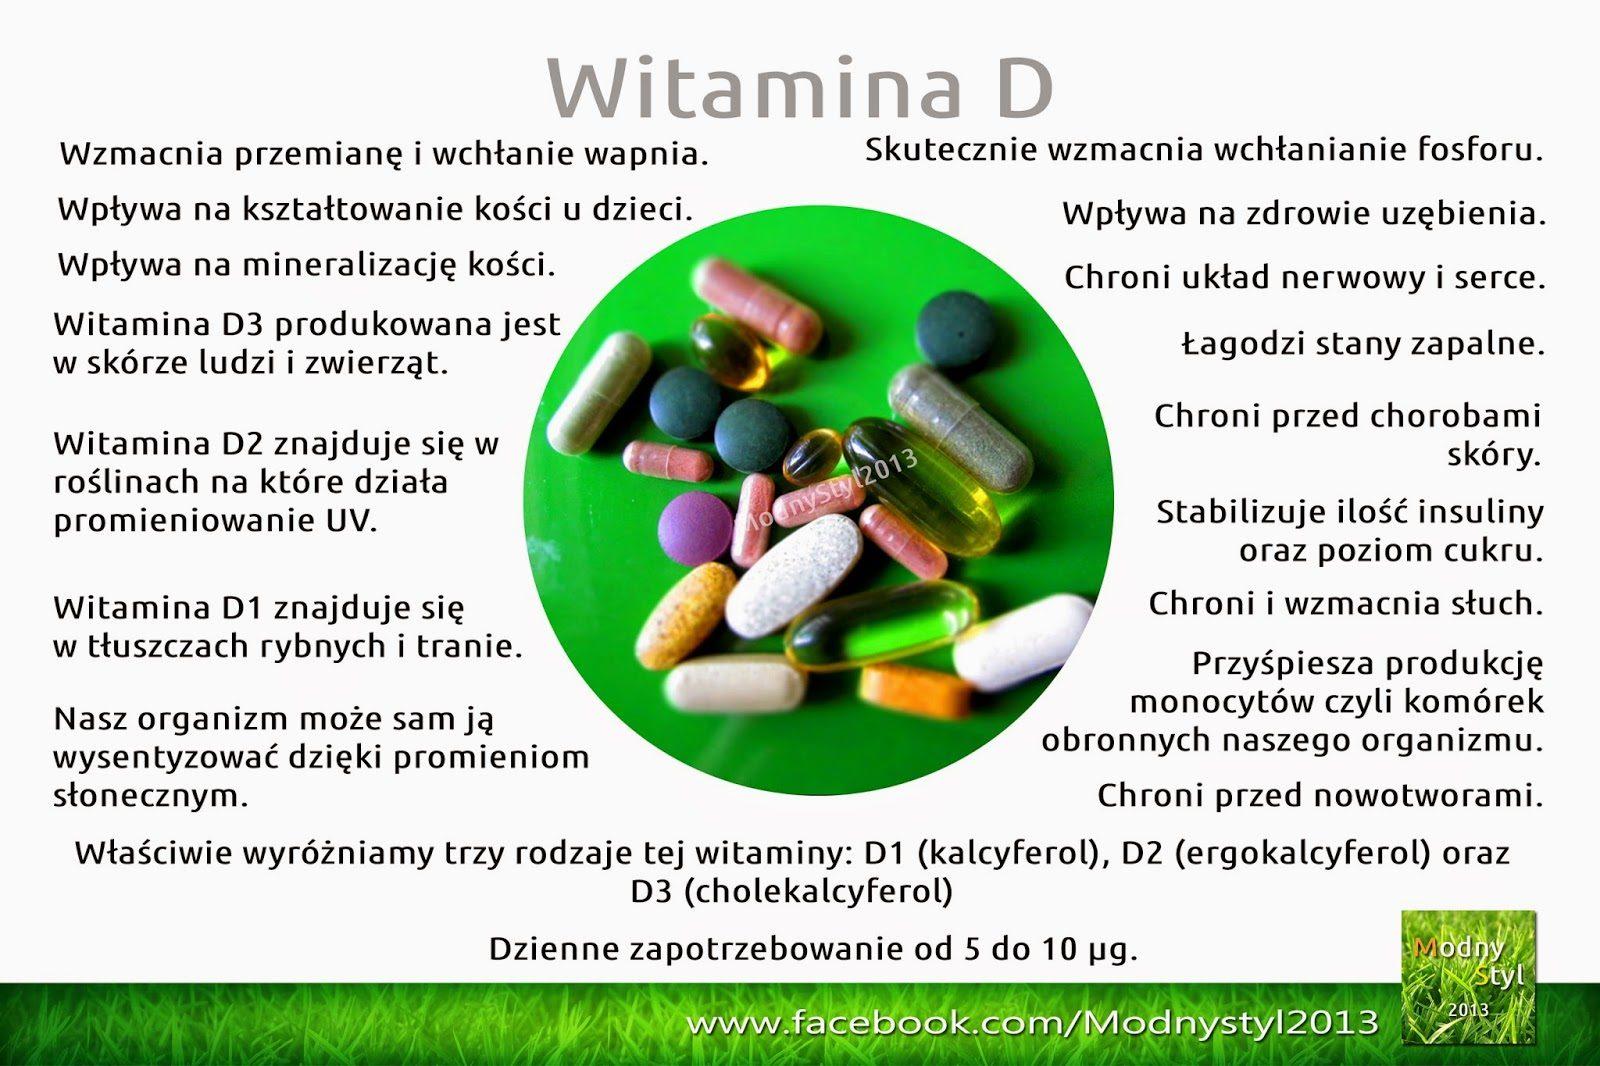 witamina2bd-8312266